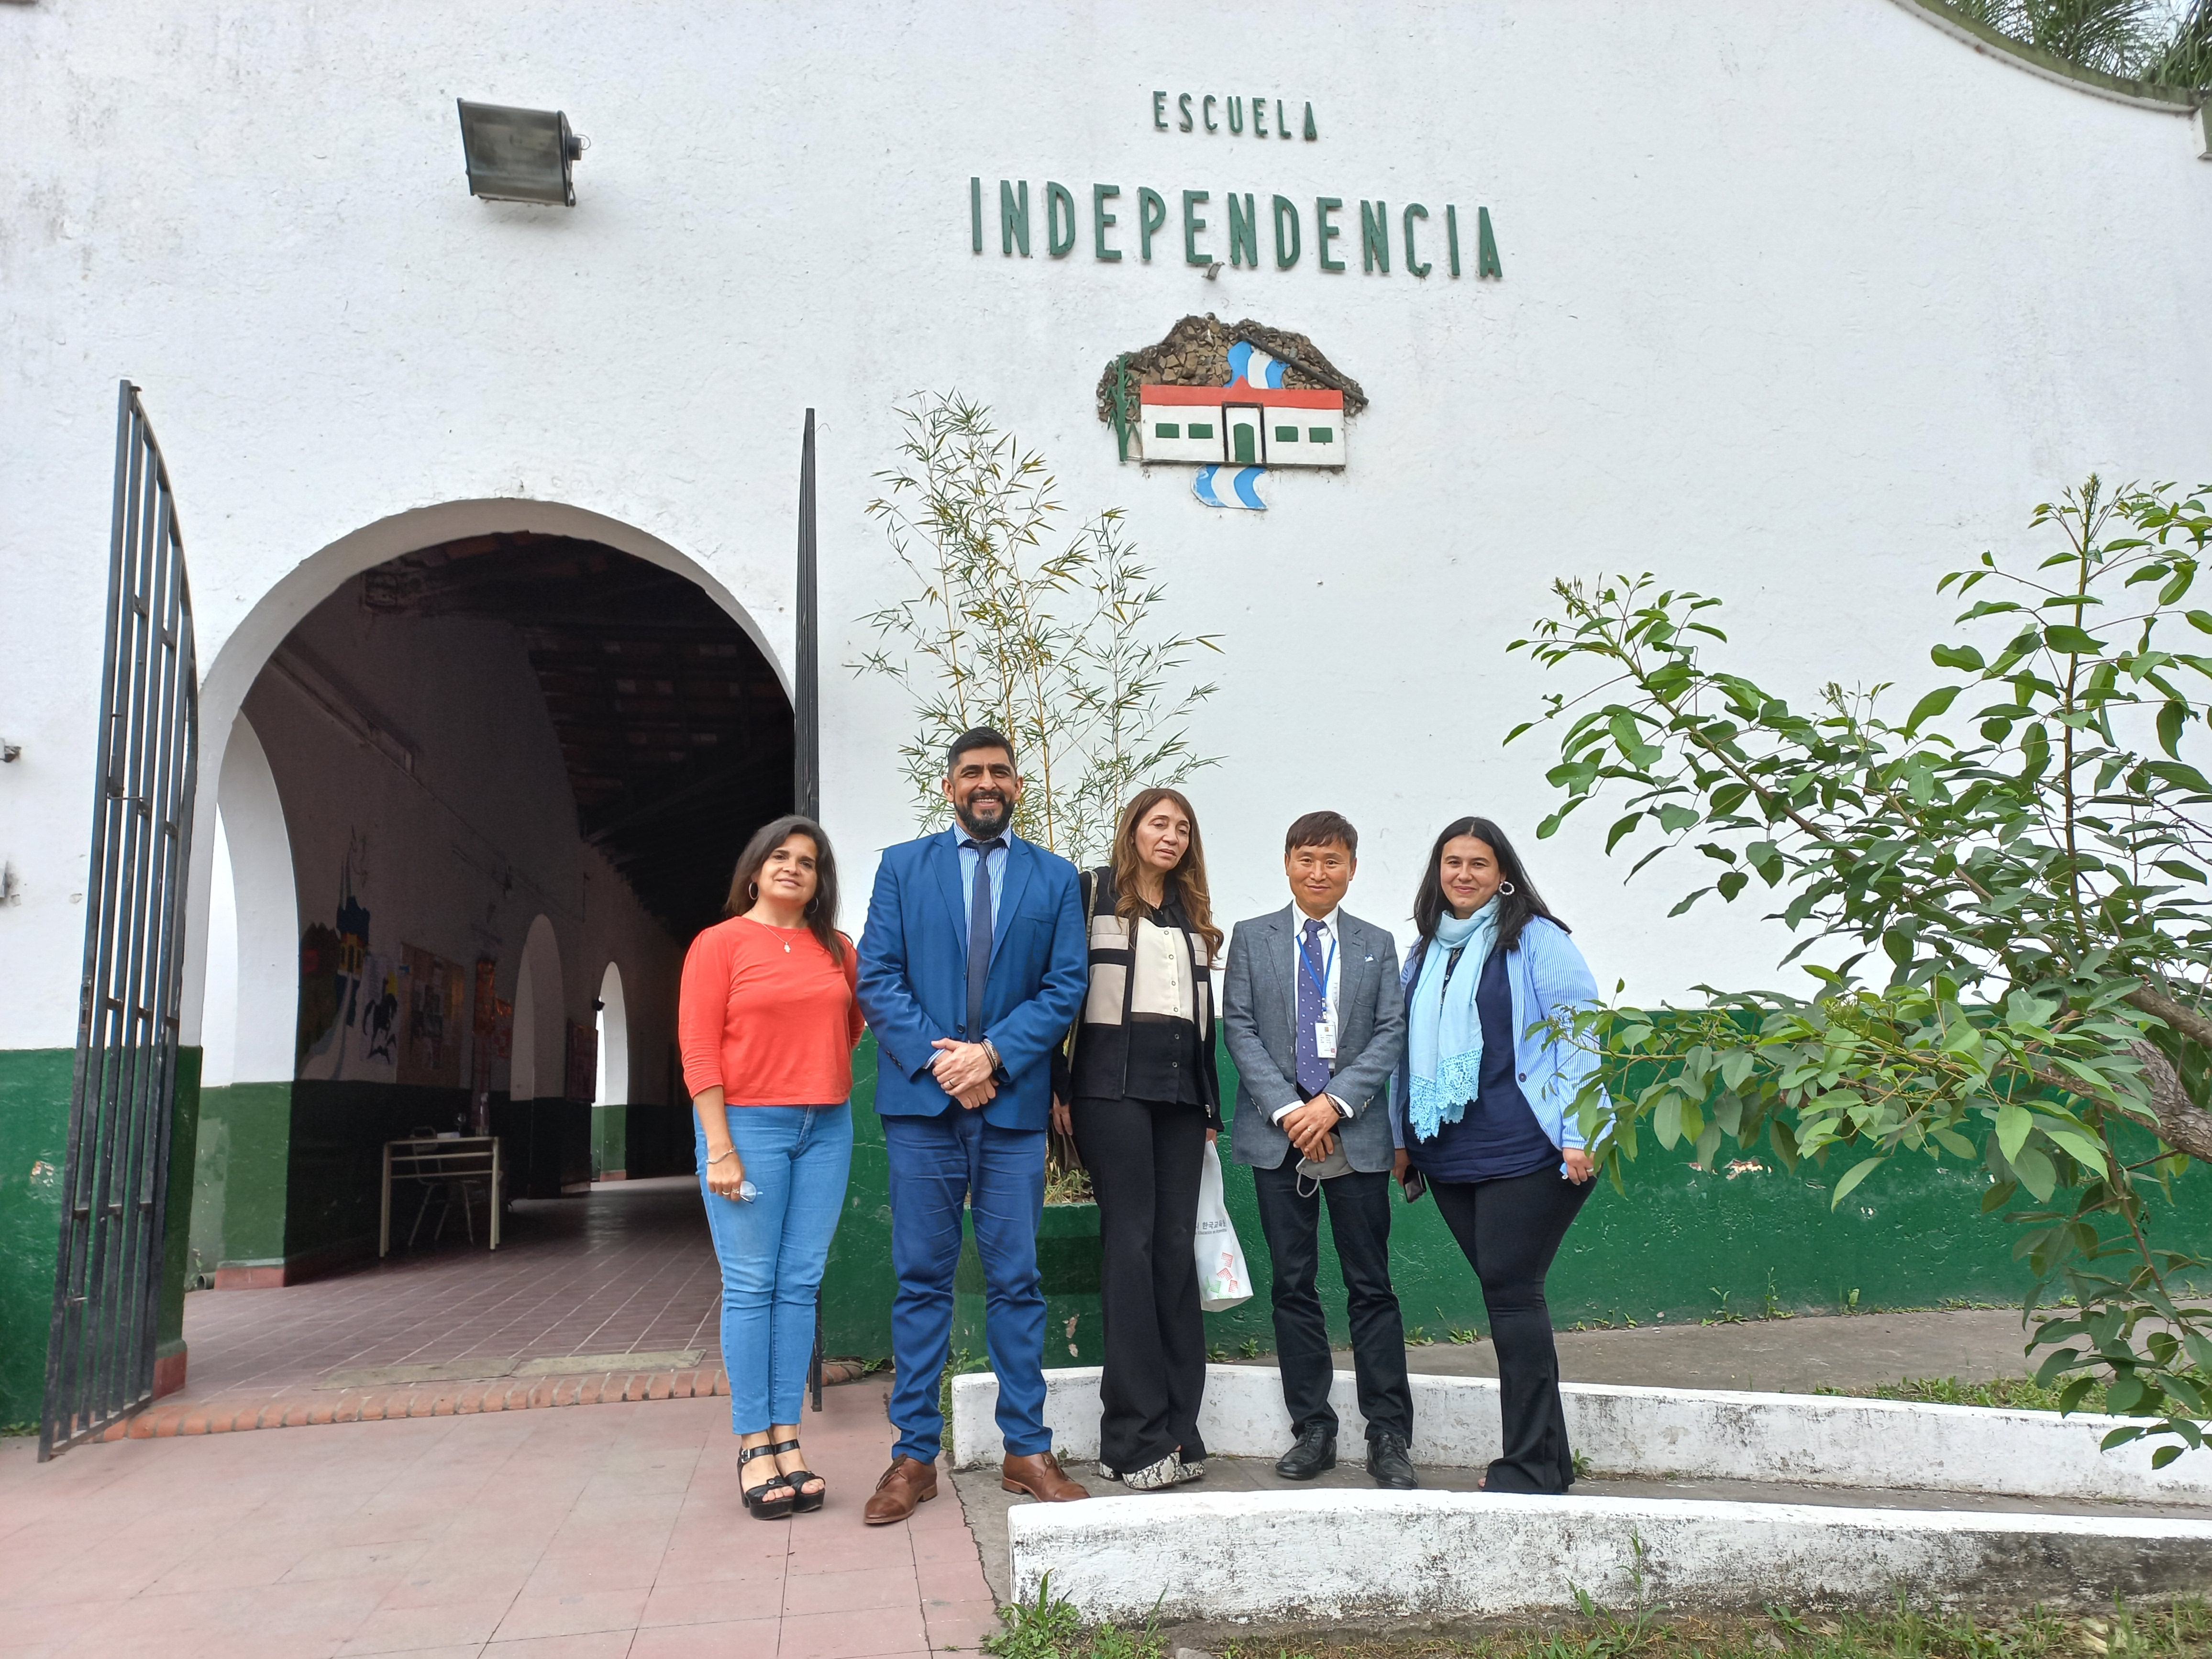 Independecia학교방문 (10).jpg